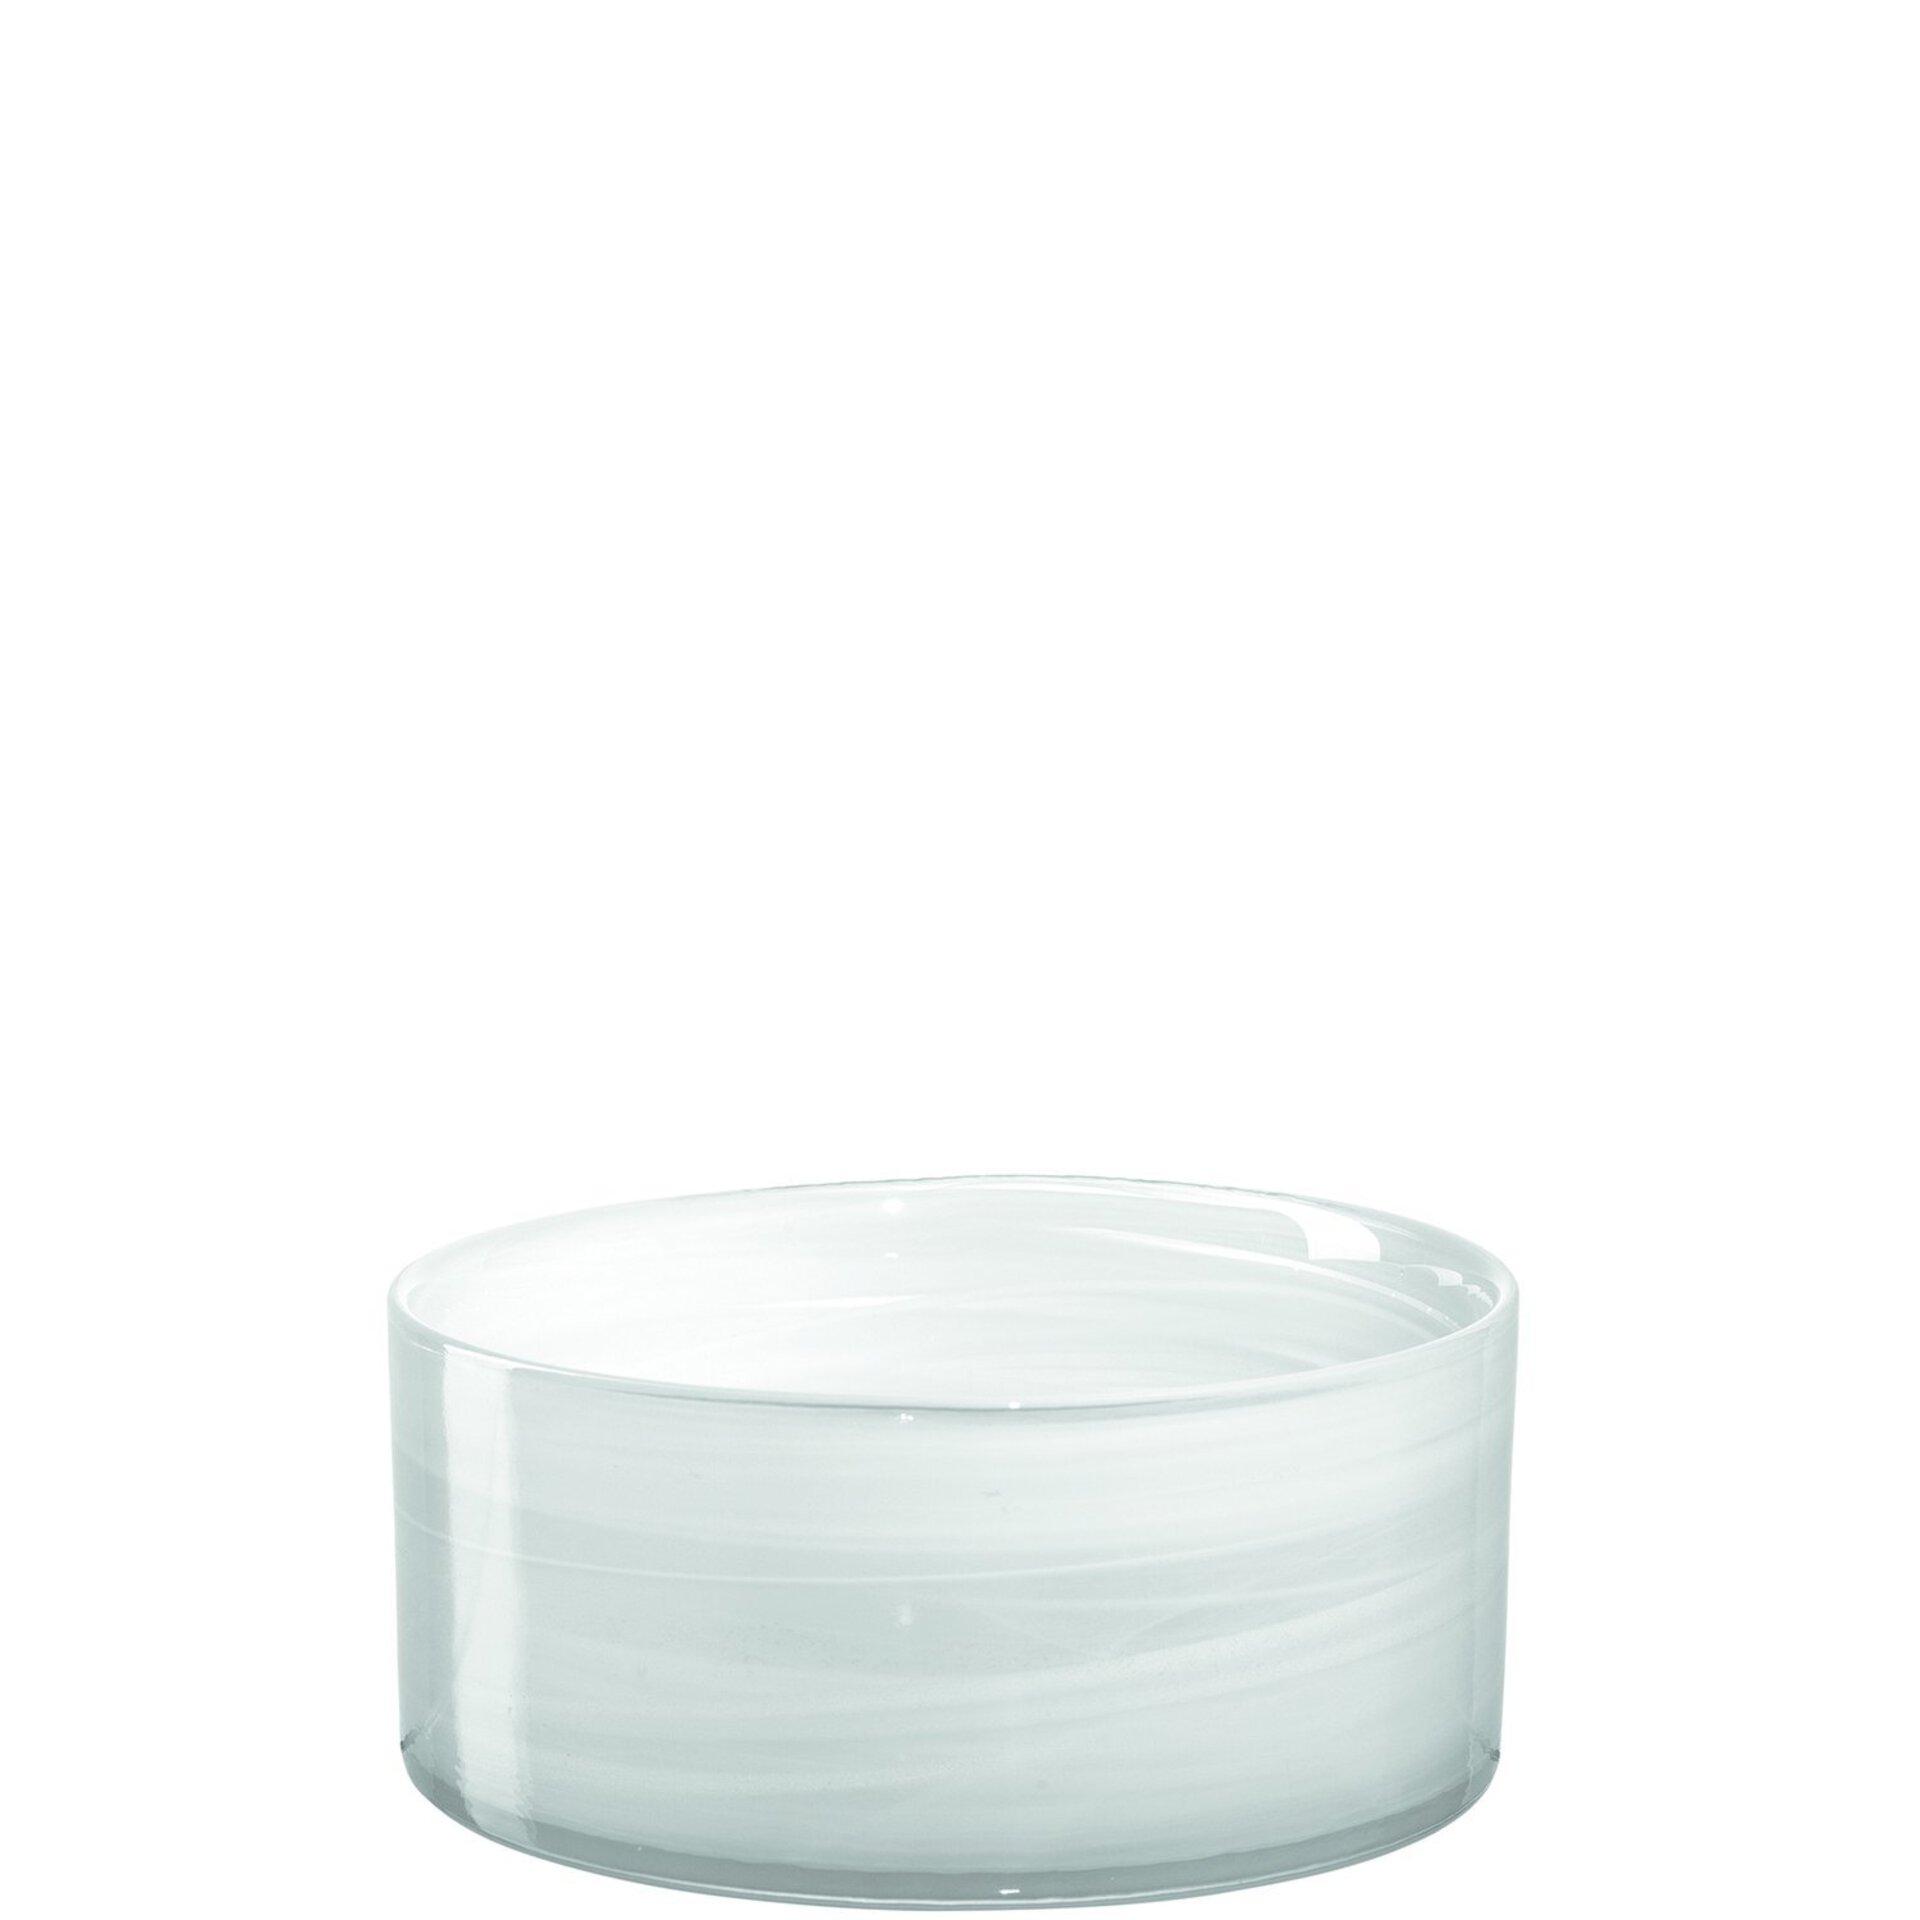 Schale SAVONA Leonardo Glas 15 x 7 x 15 cm